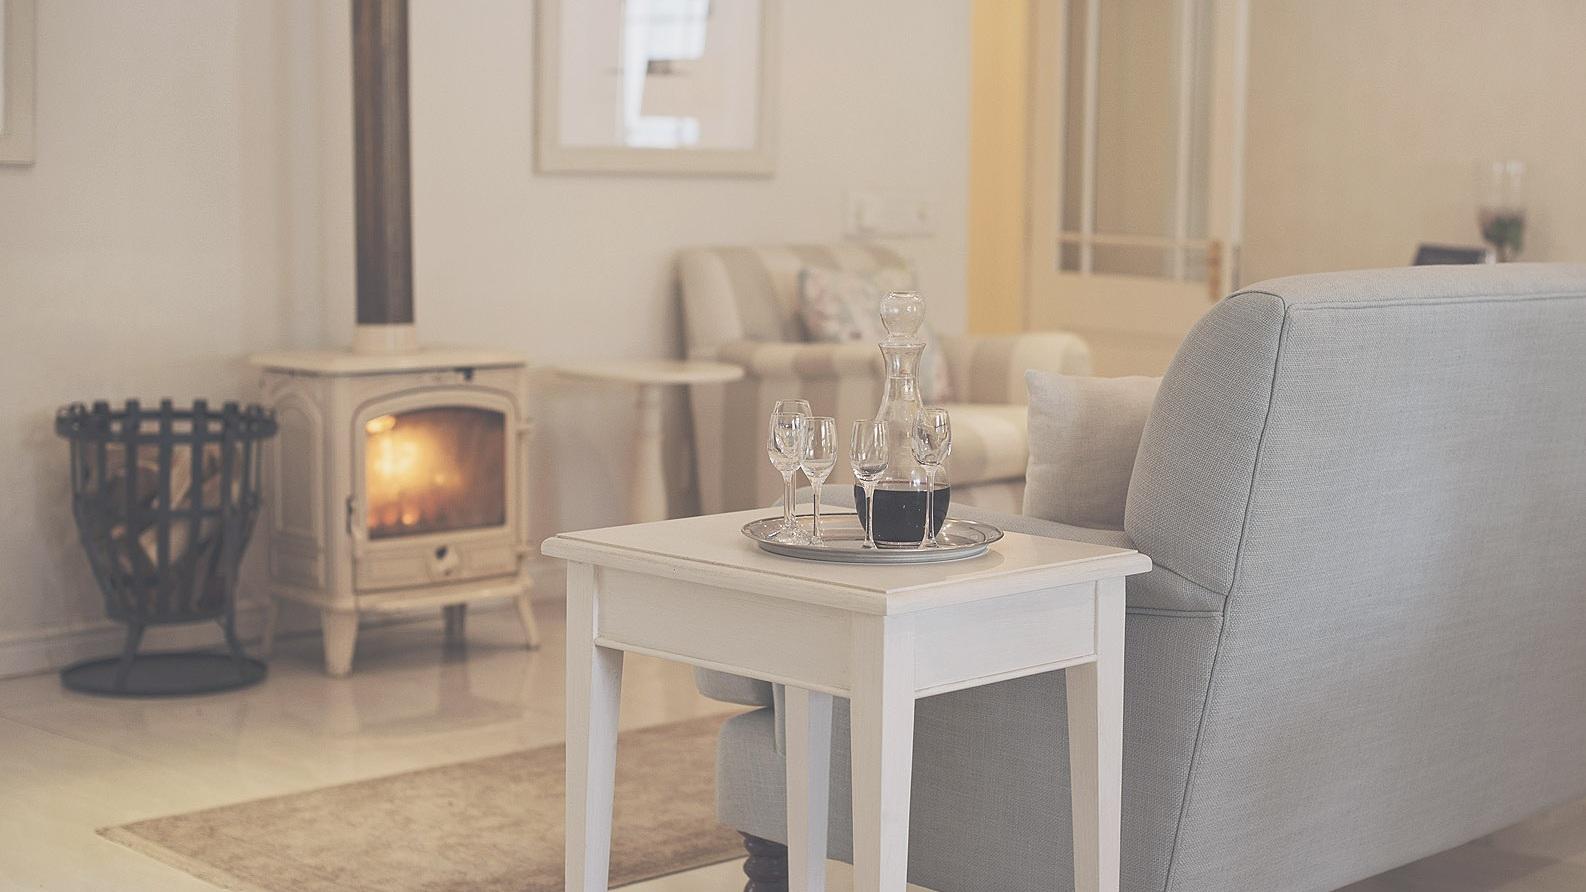 Franschhoek+fireplace+drinks.jpg